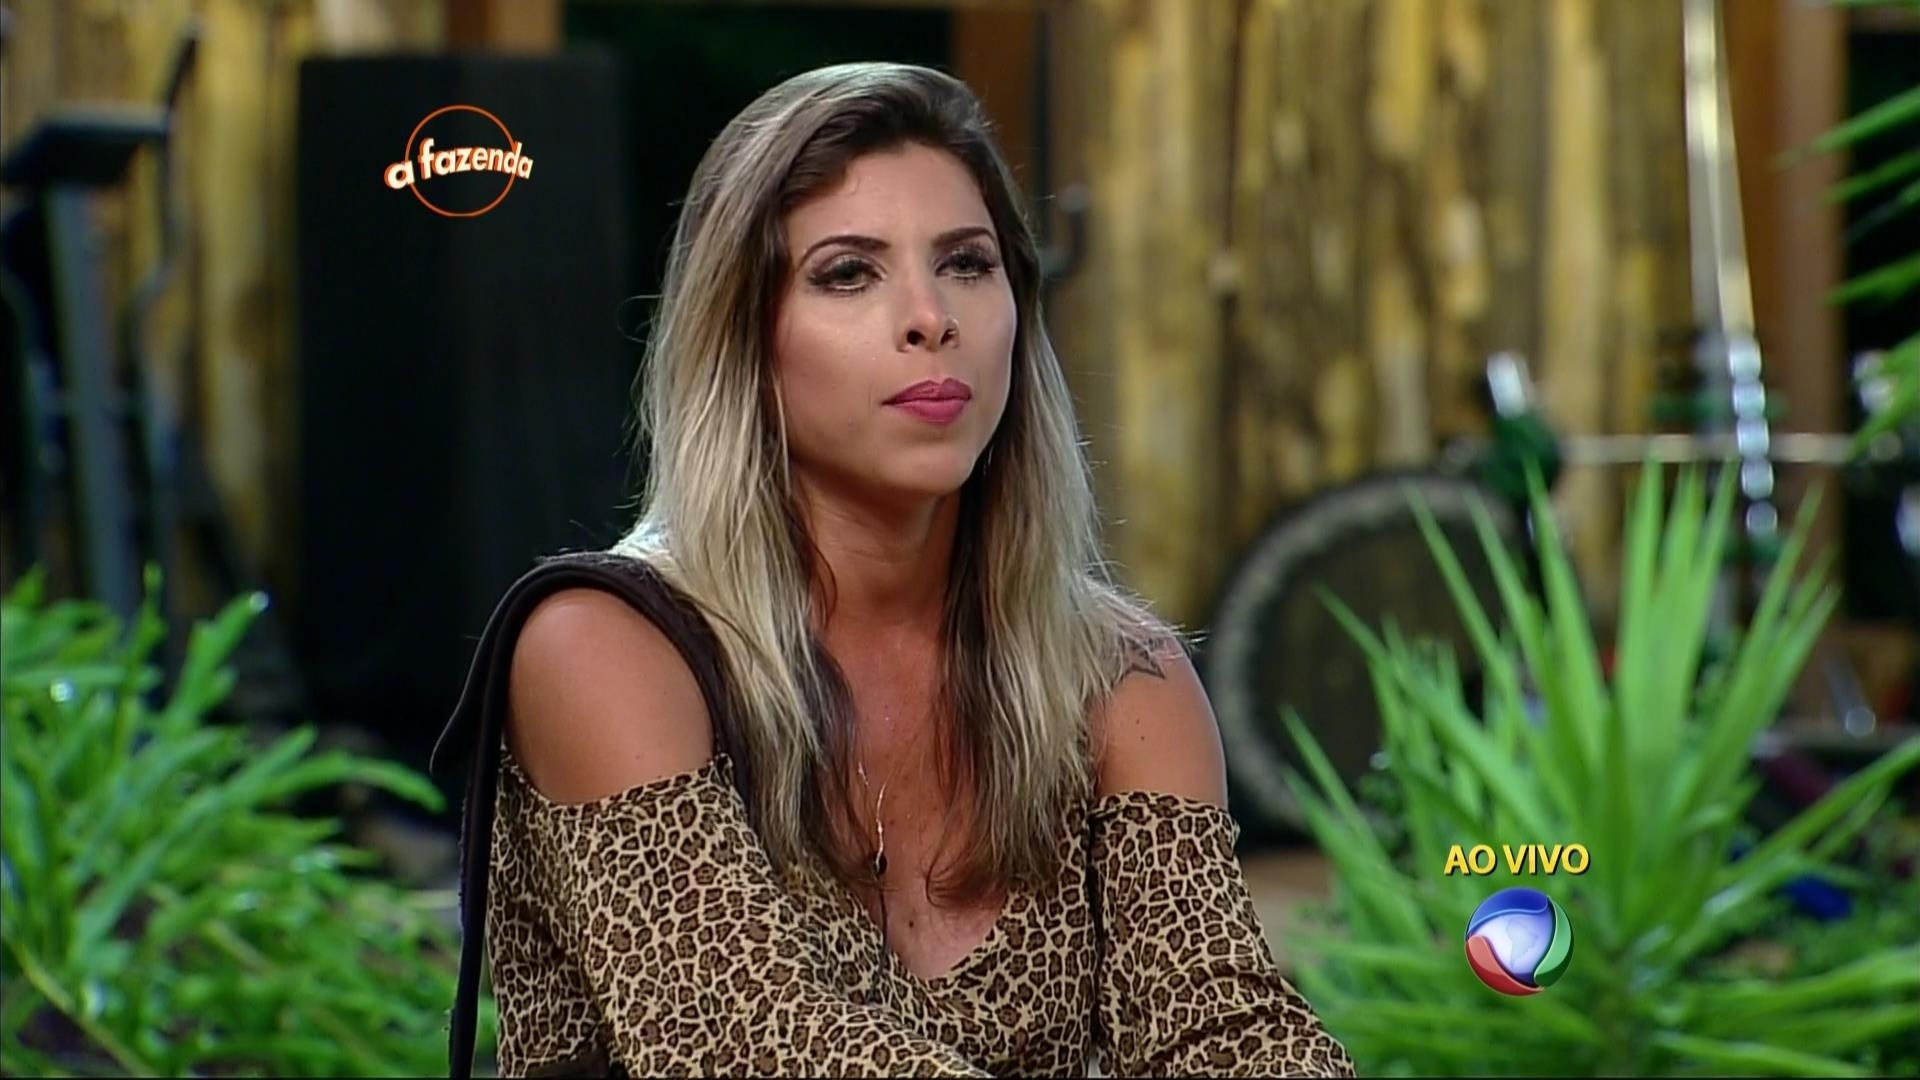 24.nov.2015 - Ana Paula Minerato criticou Rayanne Morais no programa ao vivo